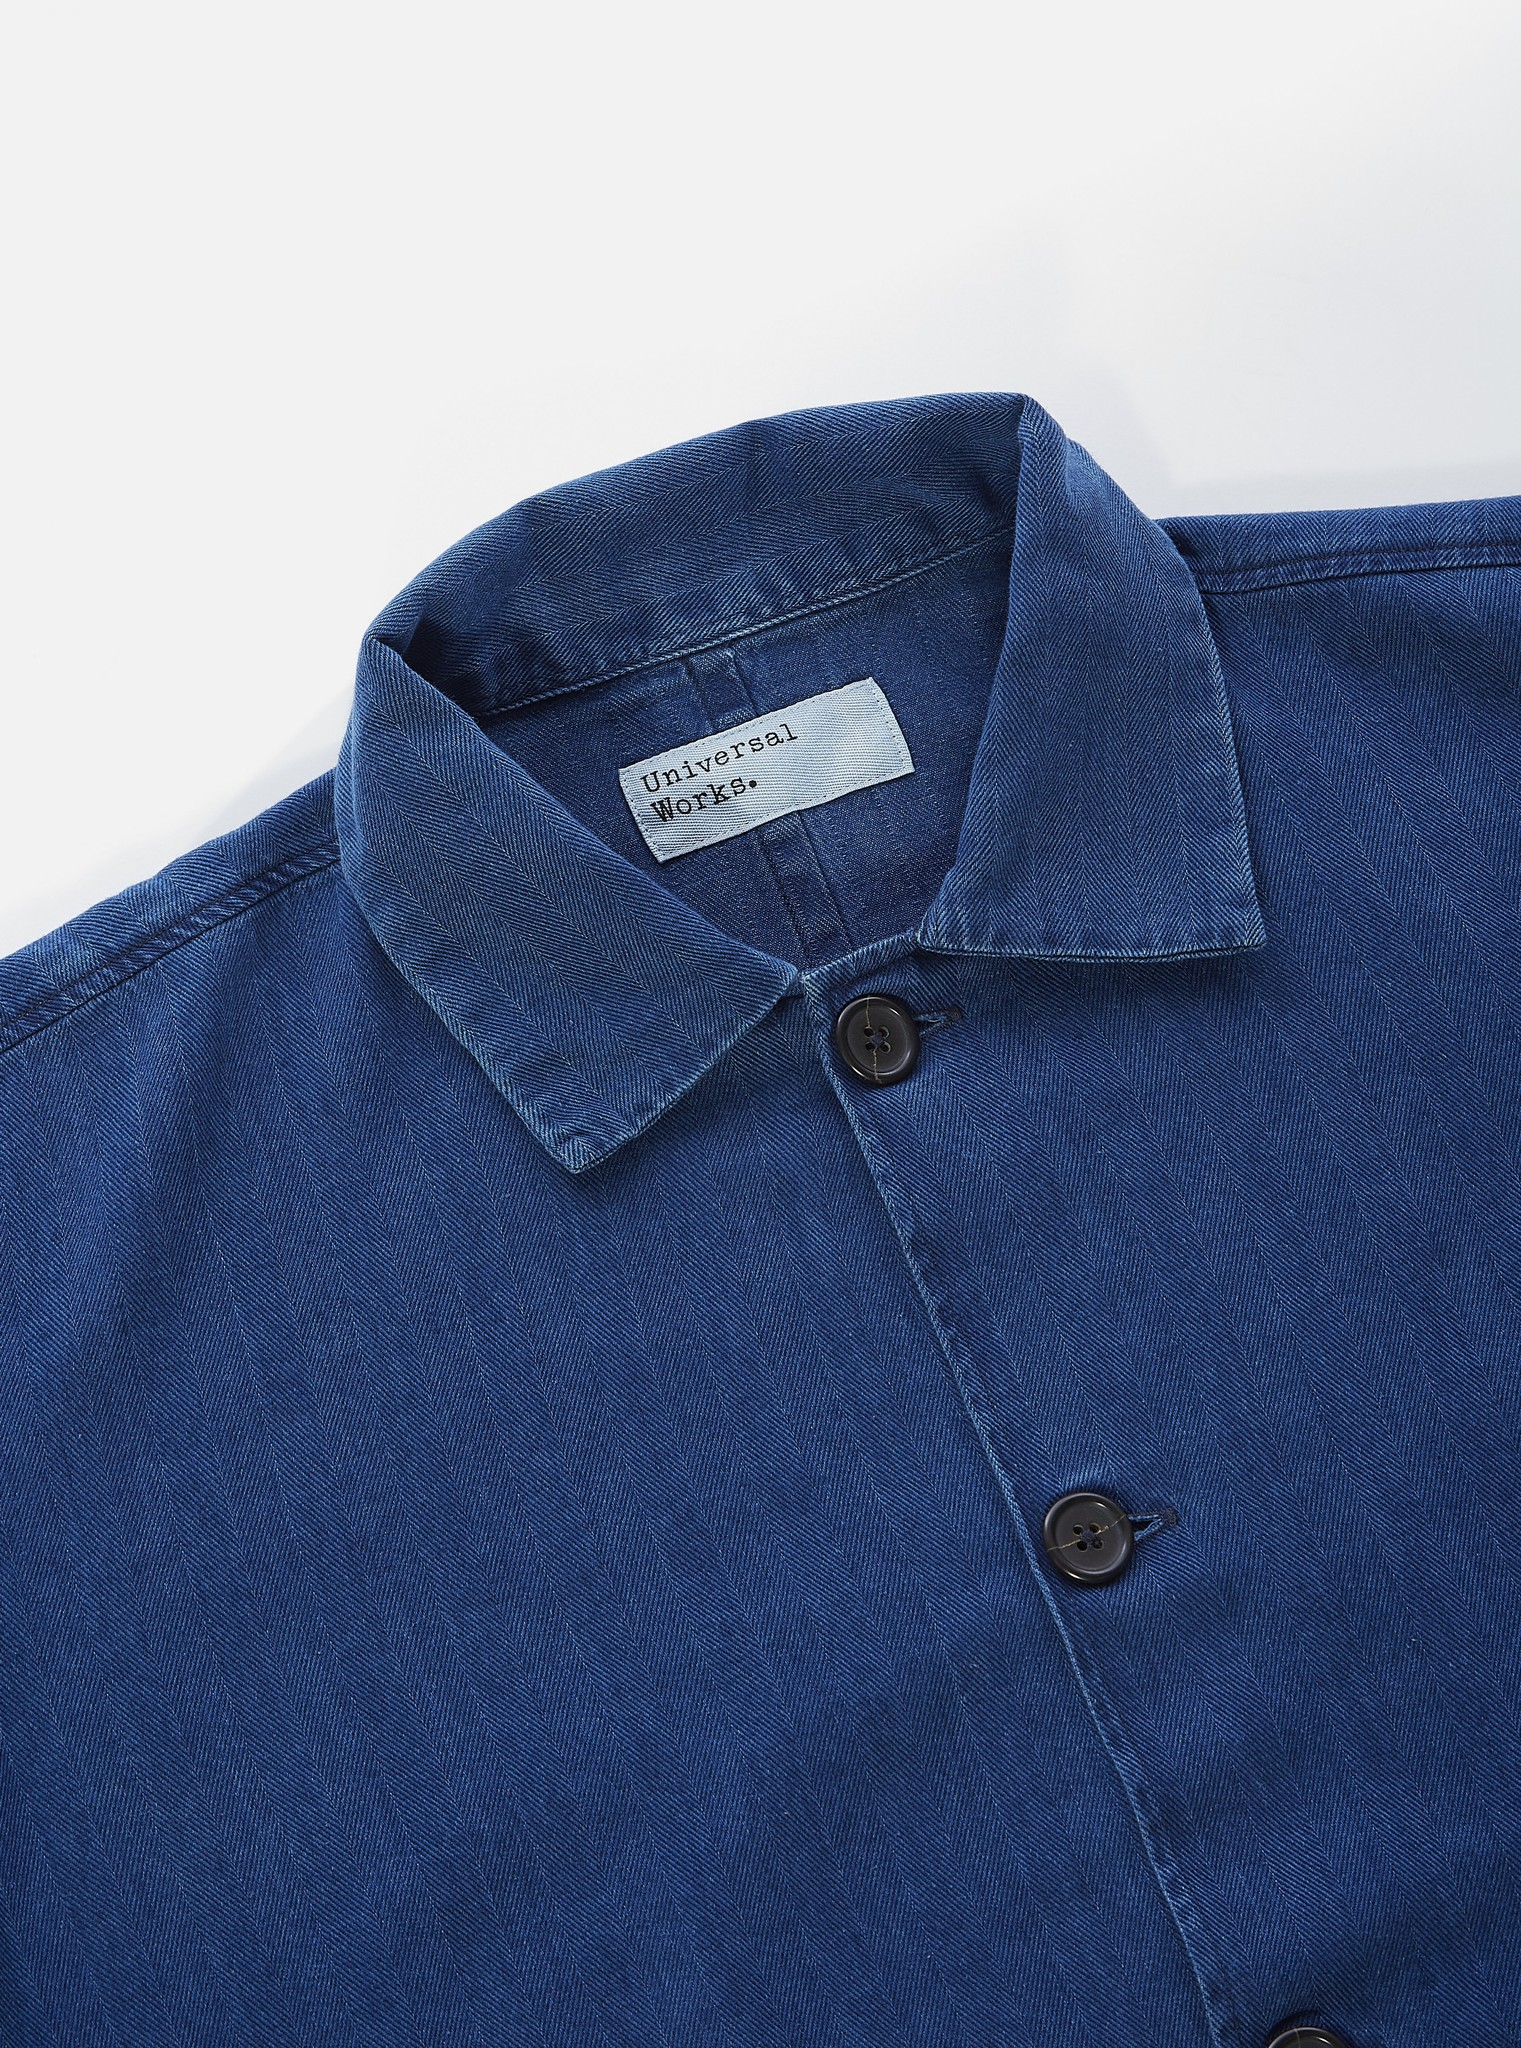 Travail Blue Shirt Washed Indigo-3